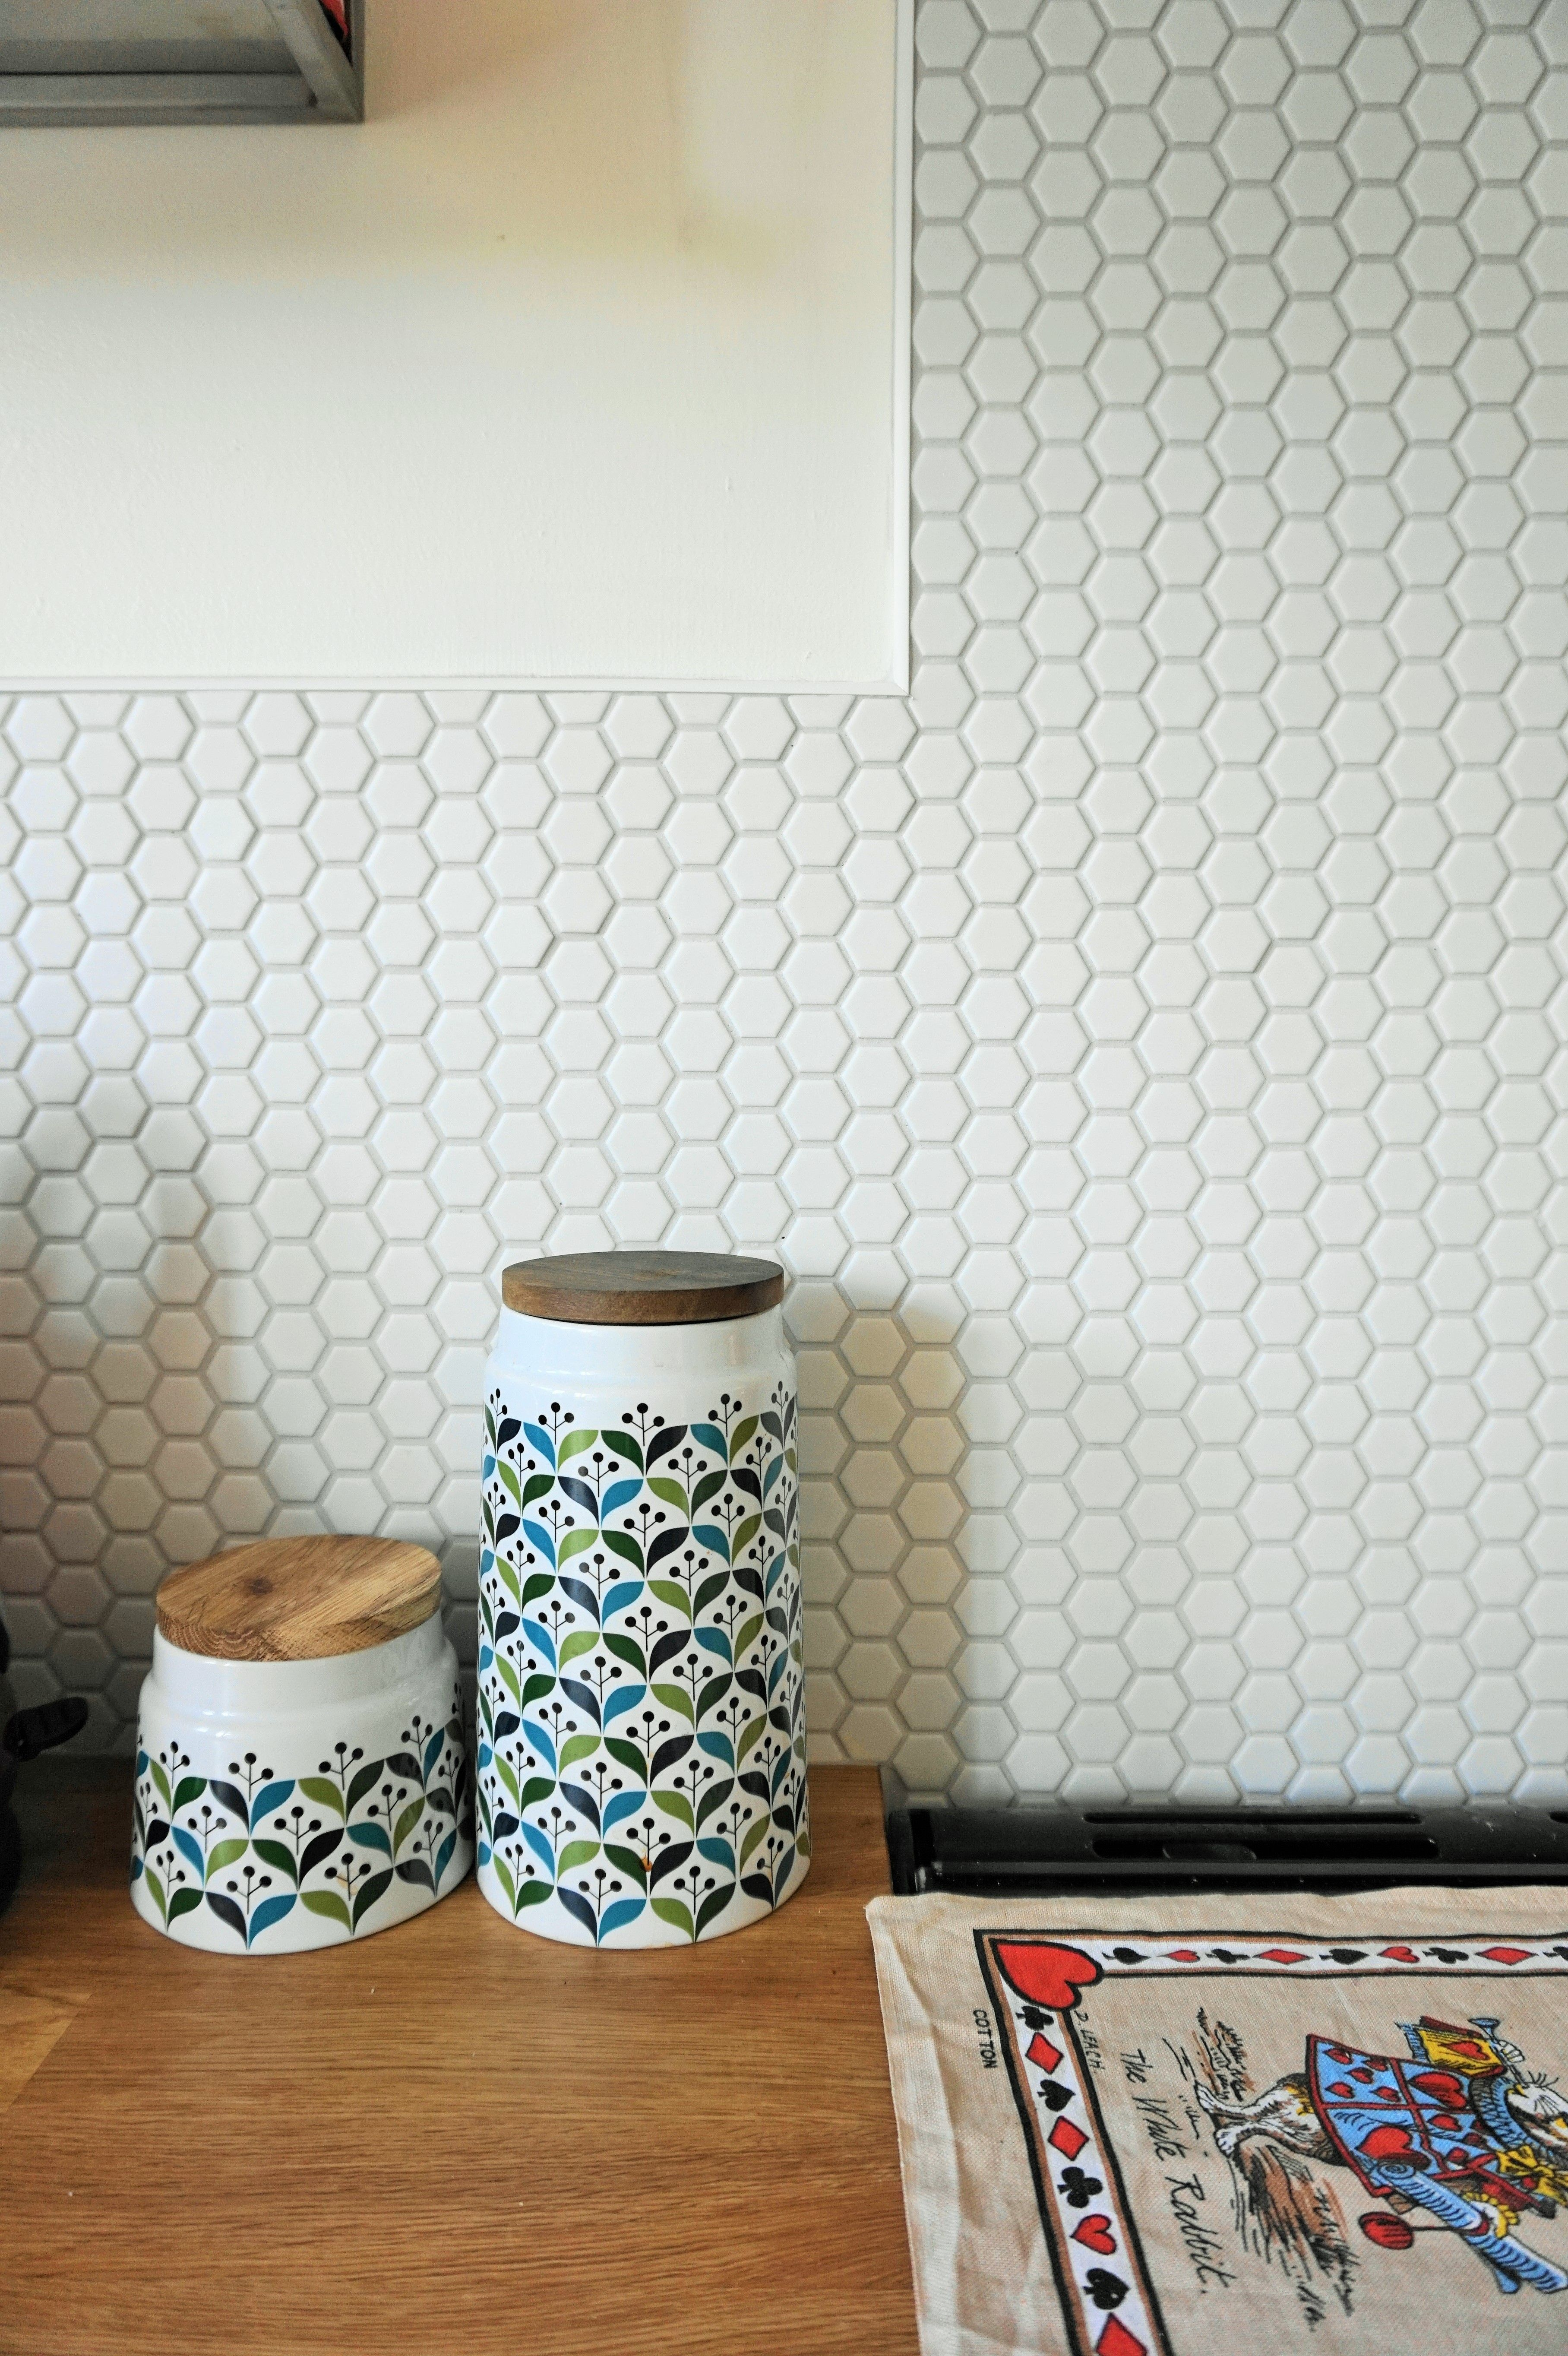 Hexagon Tiles ~ Splashback Revealed | Honeycombs, Kitchens and Modern